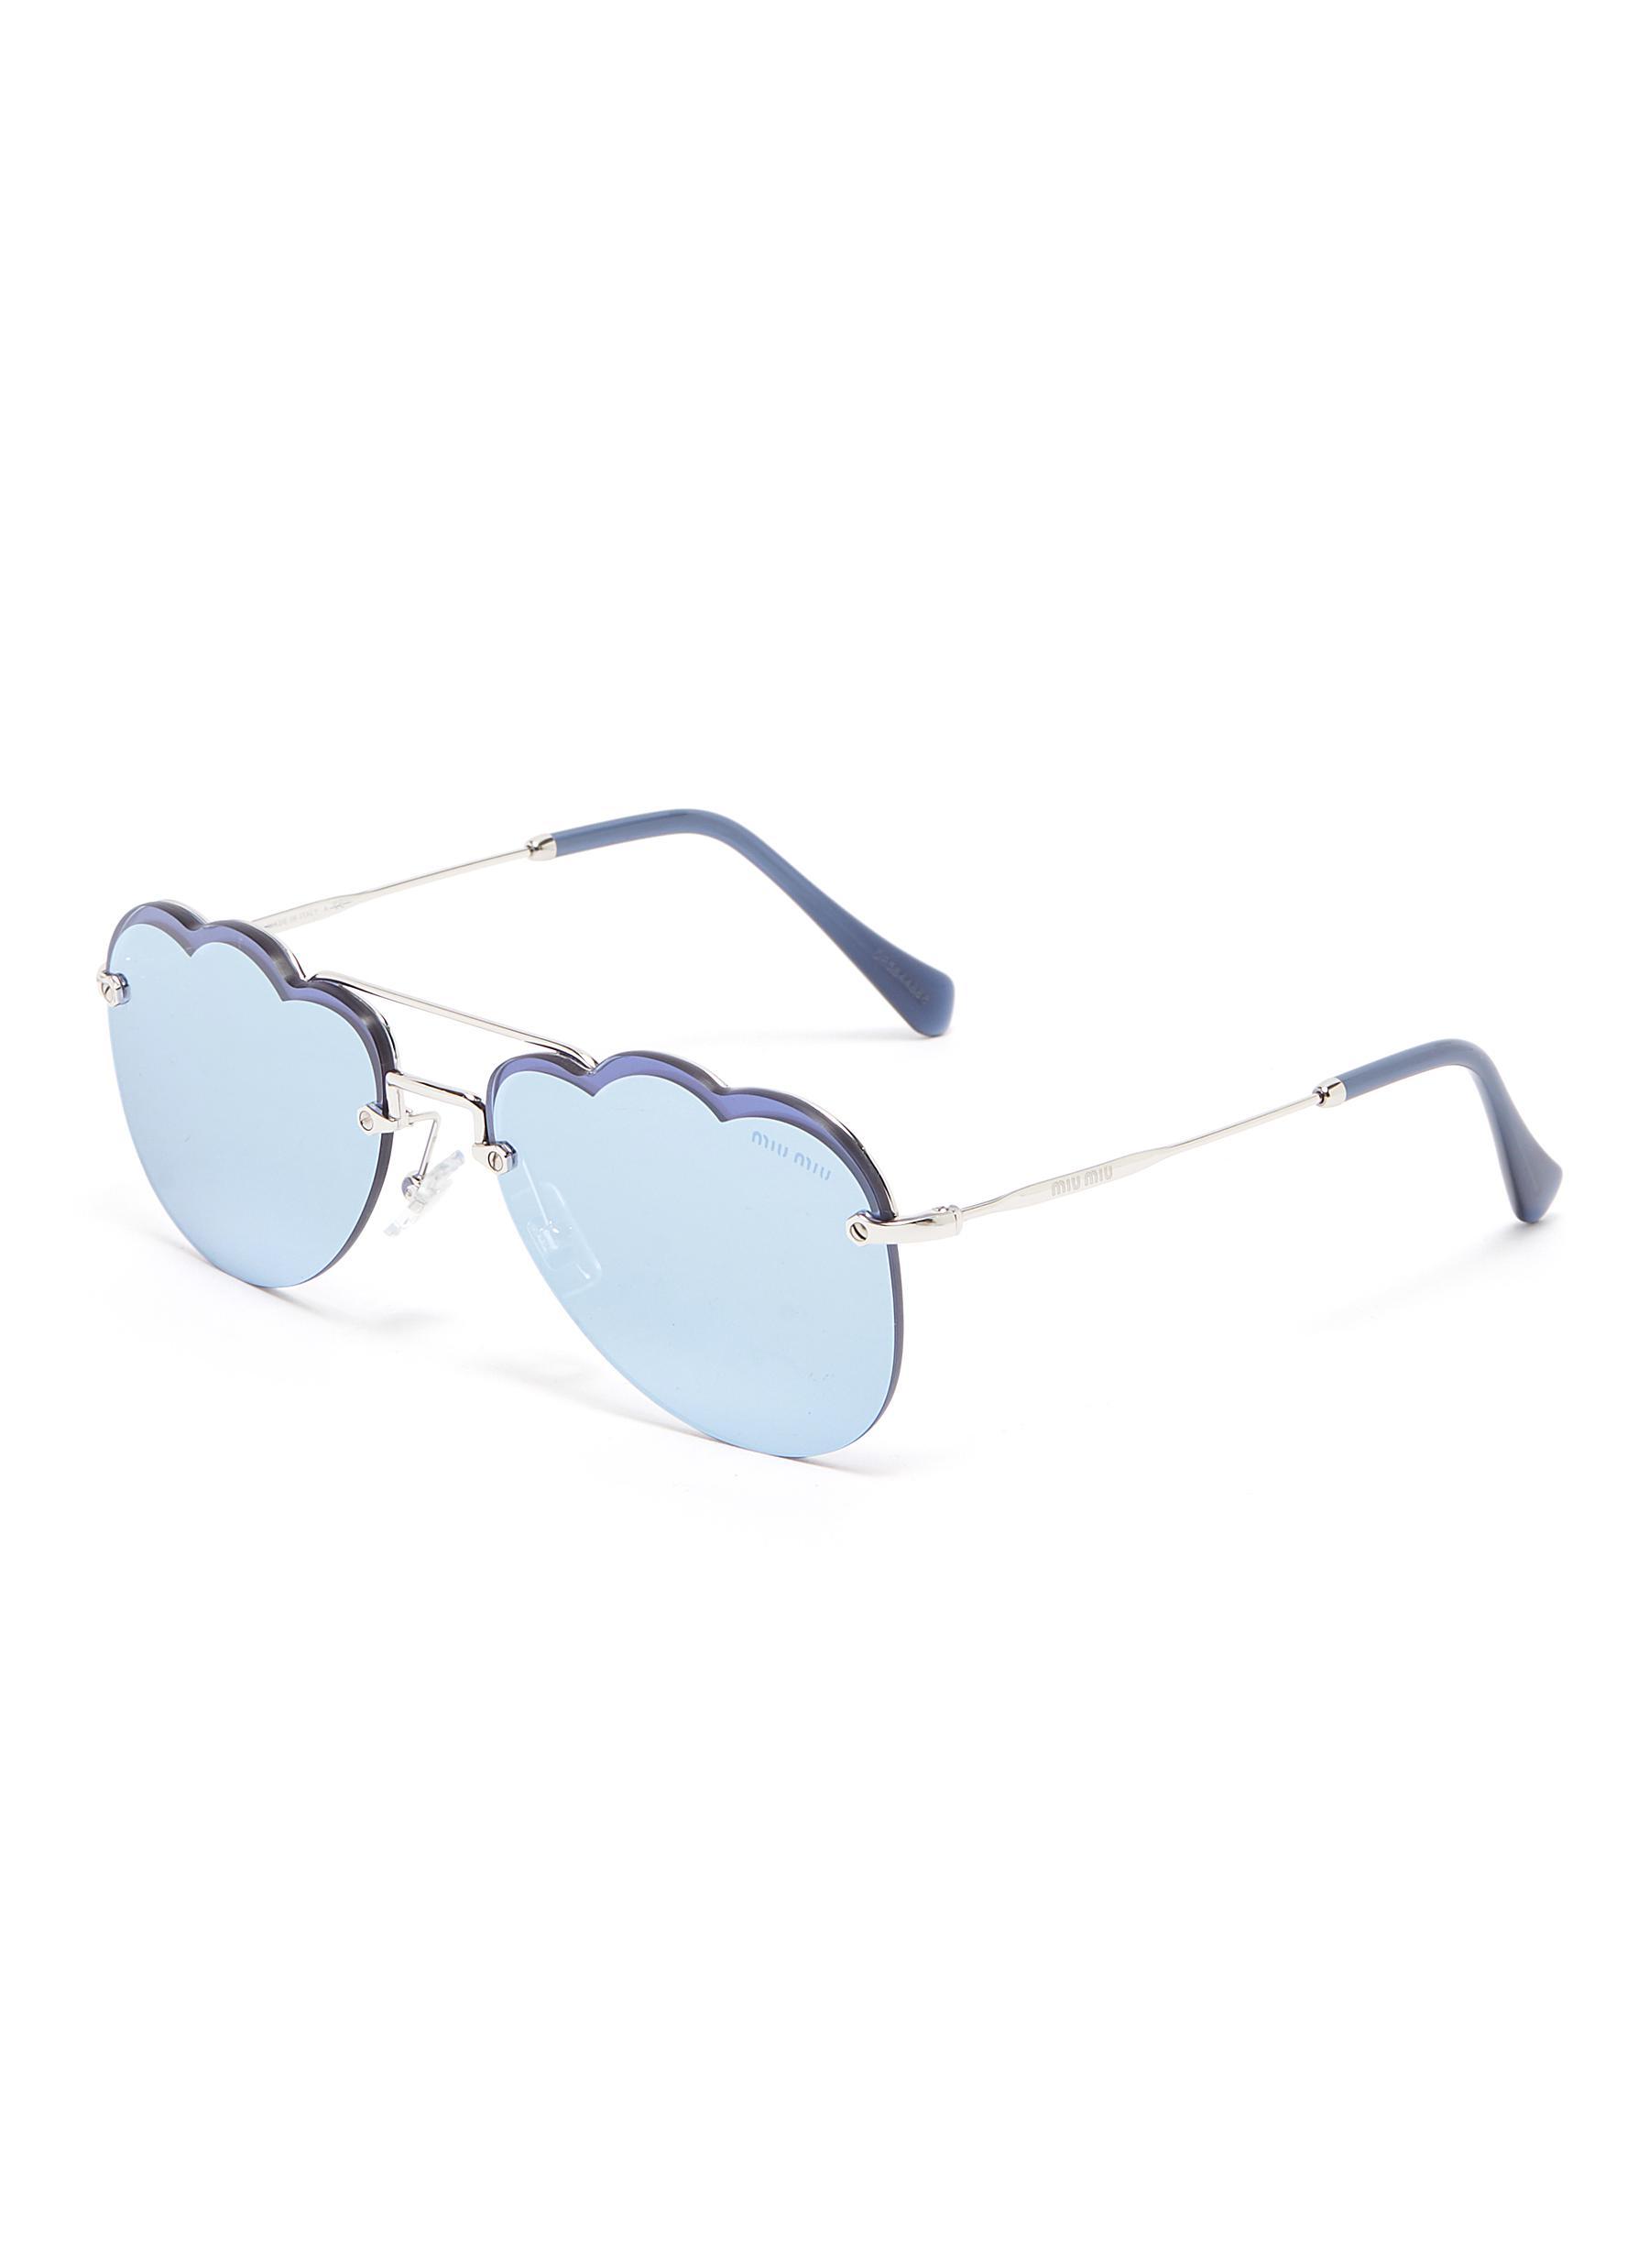 0a16c55f5 Main View - Click To Enlarge - MIU MIU - Mirror metal cloud frame sunglasses